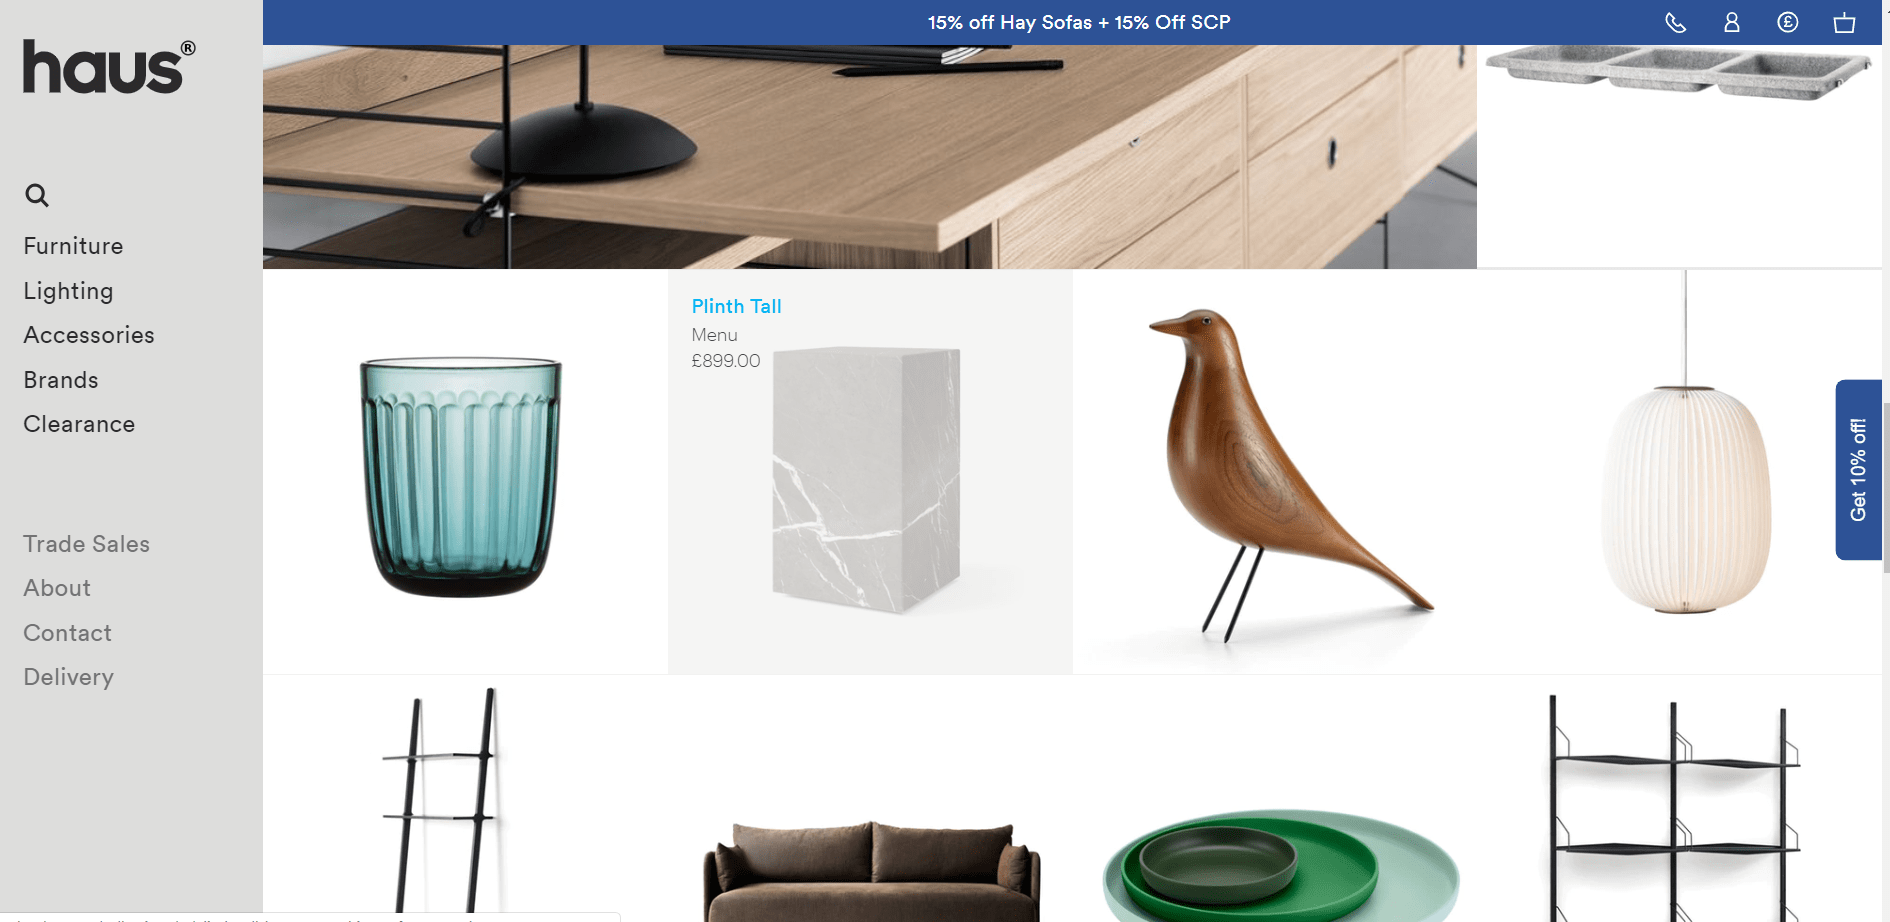 website design ideas - product gallery